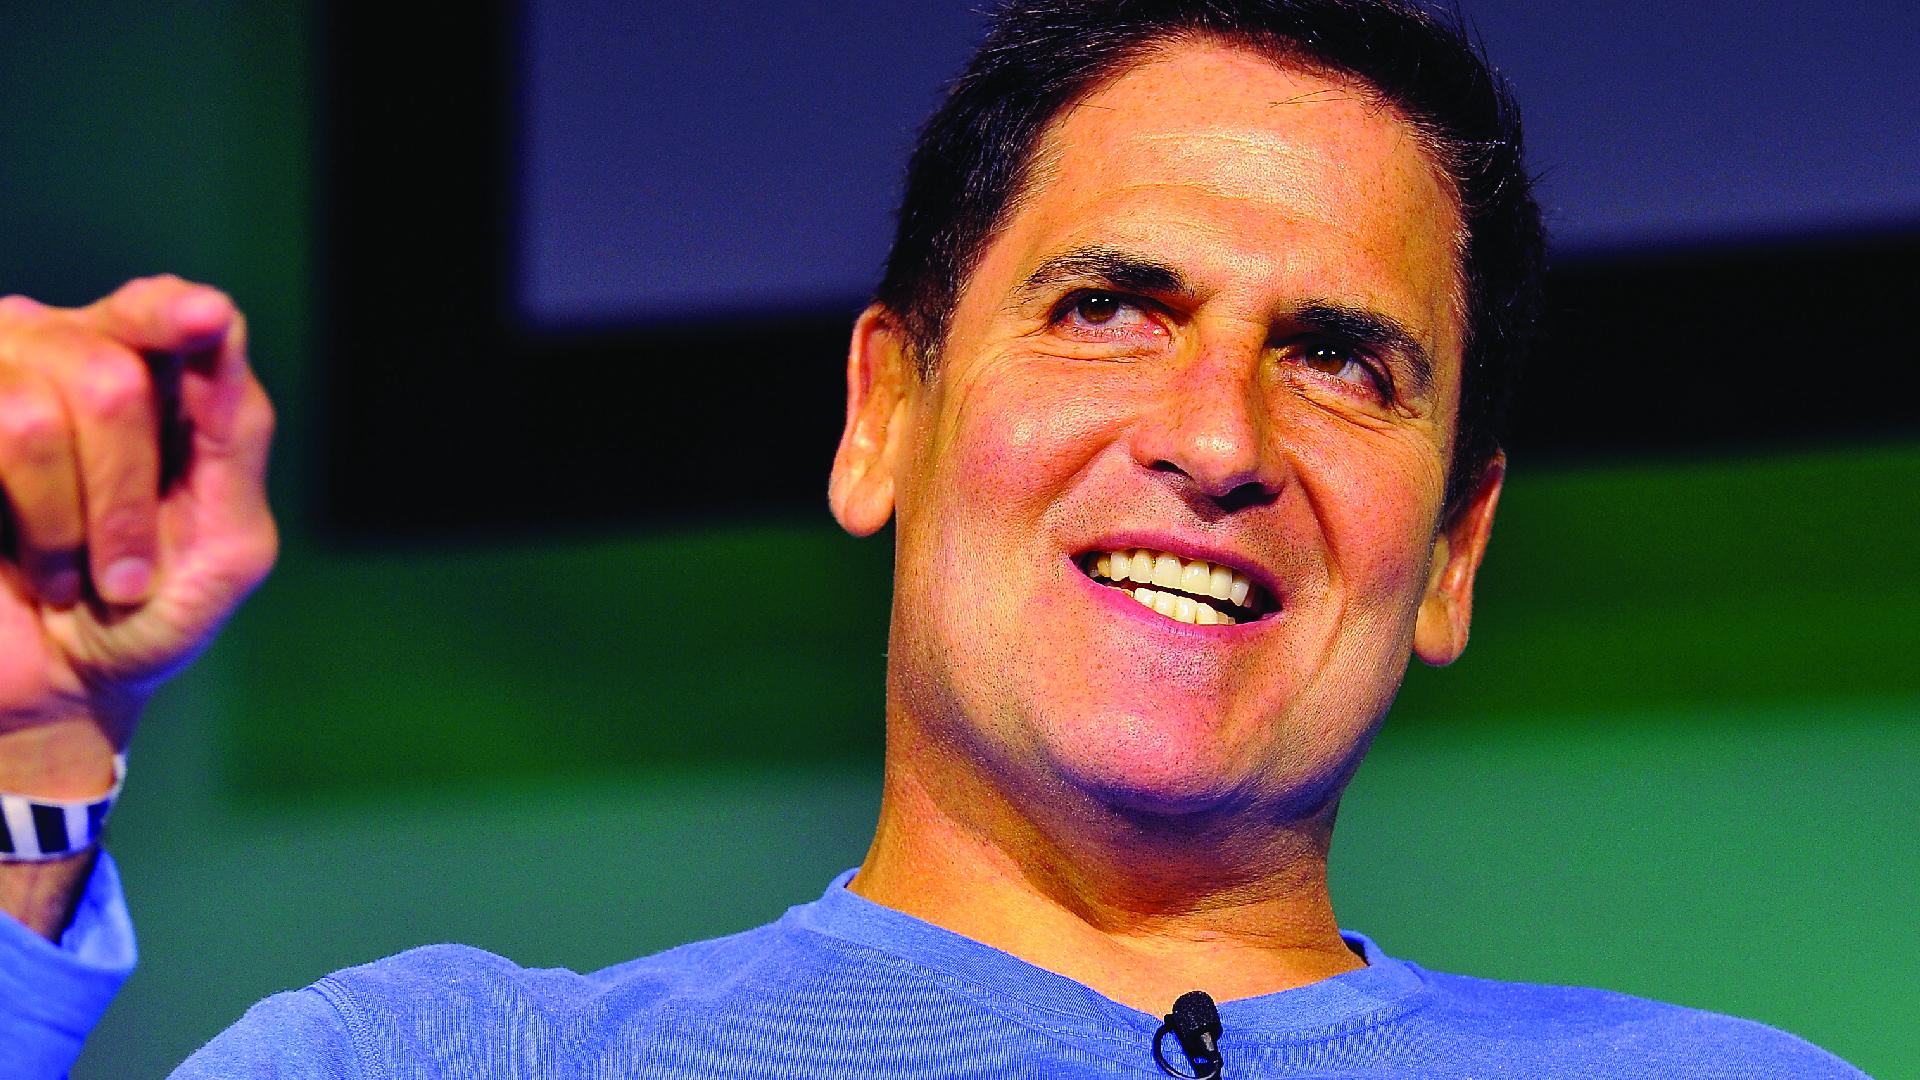 Mark Cuban joins in $6 million SAFT fundraise for AlchemyNFT